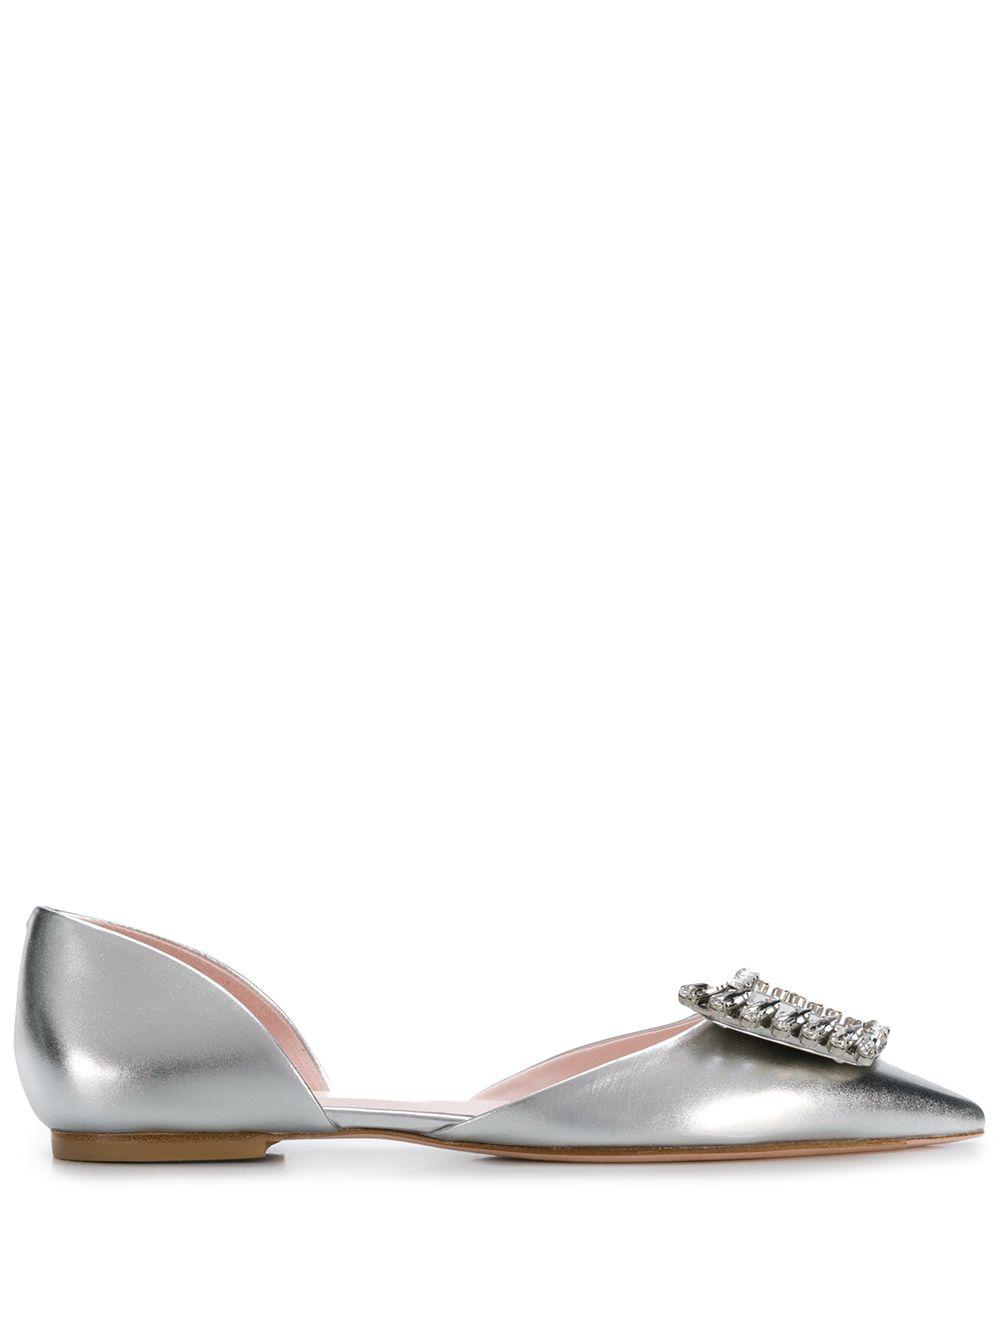 Dorsay Leather Ballet Flat